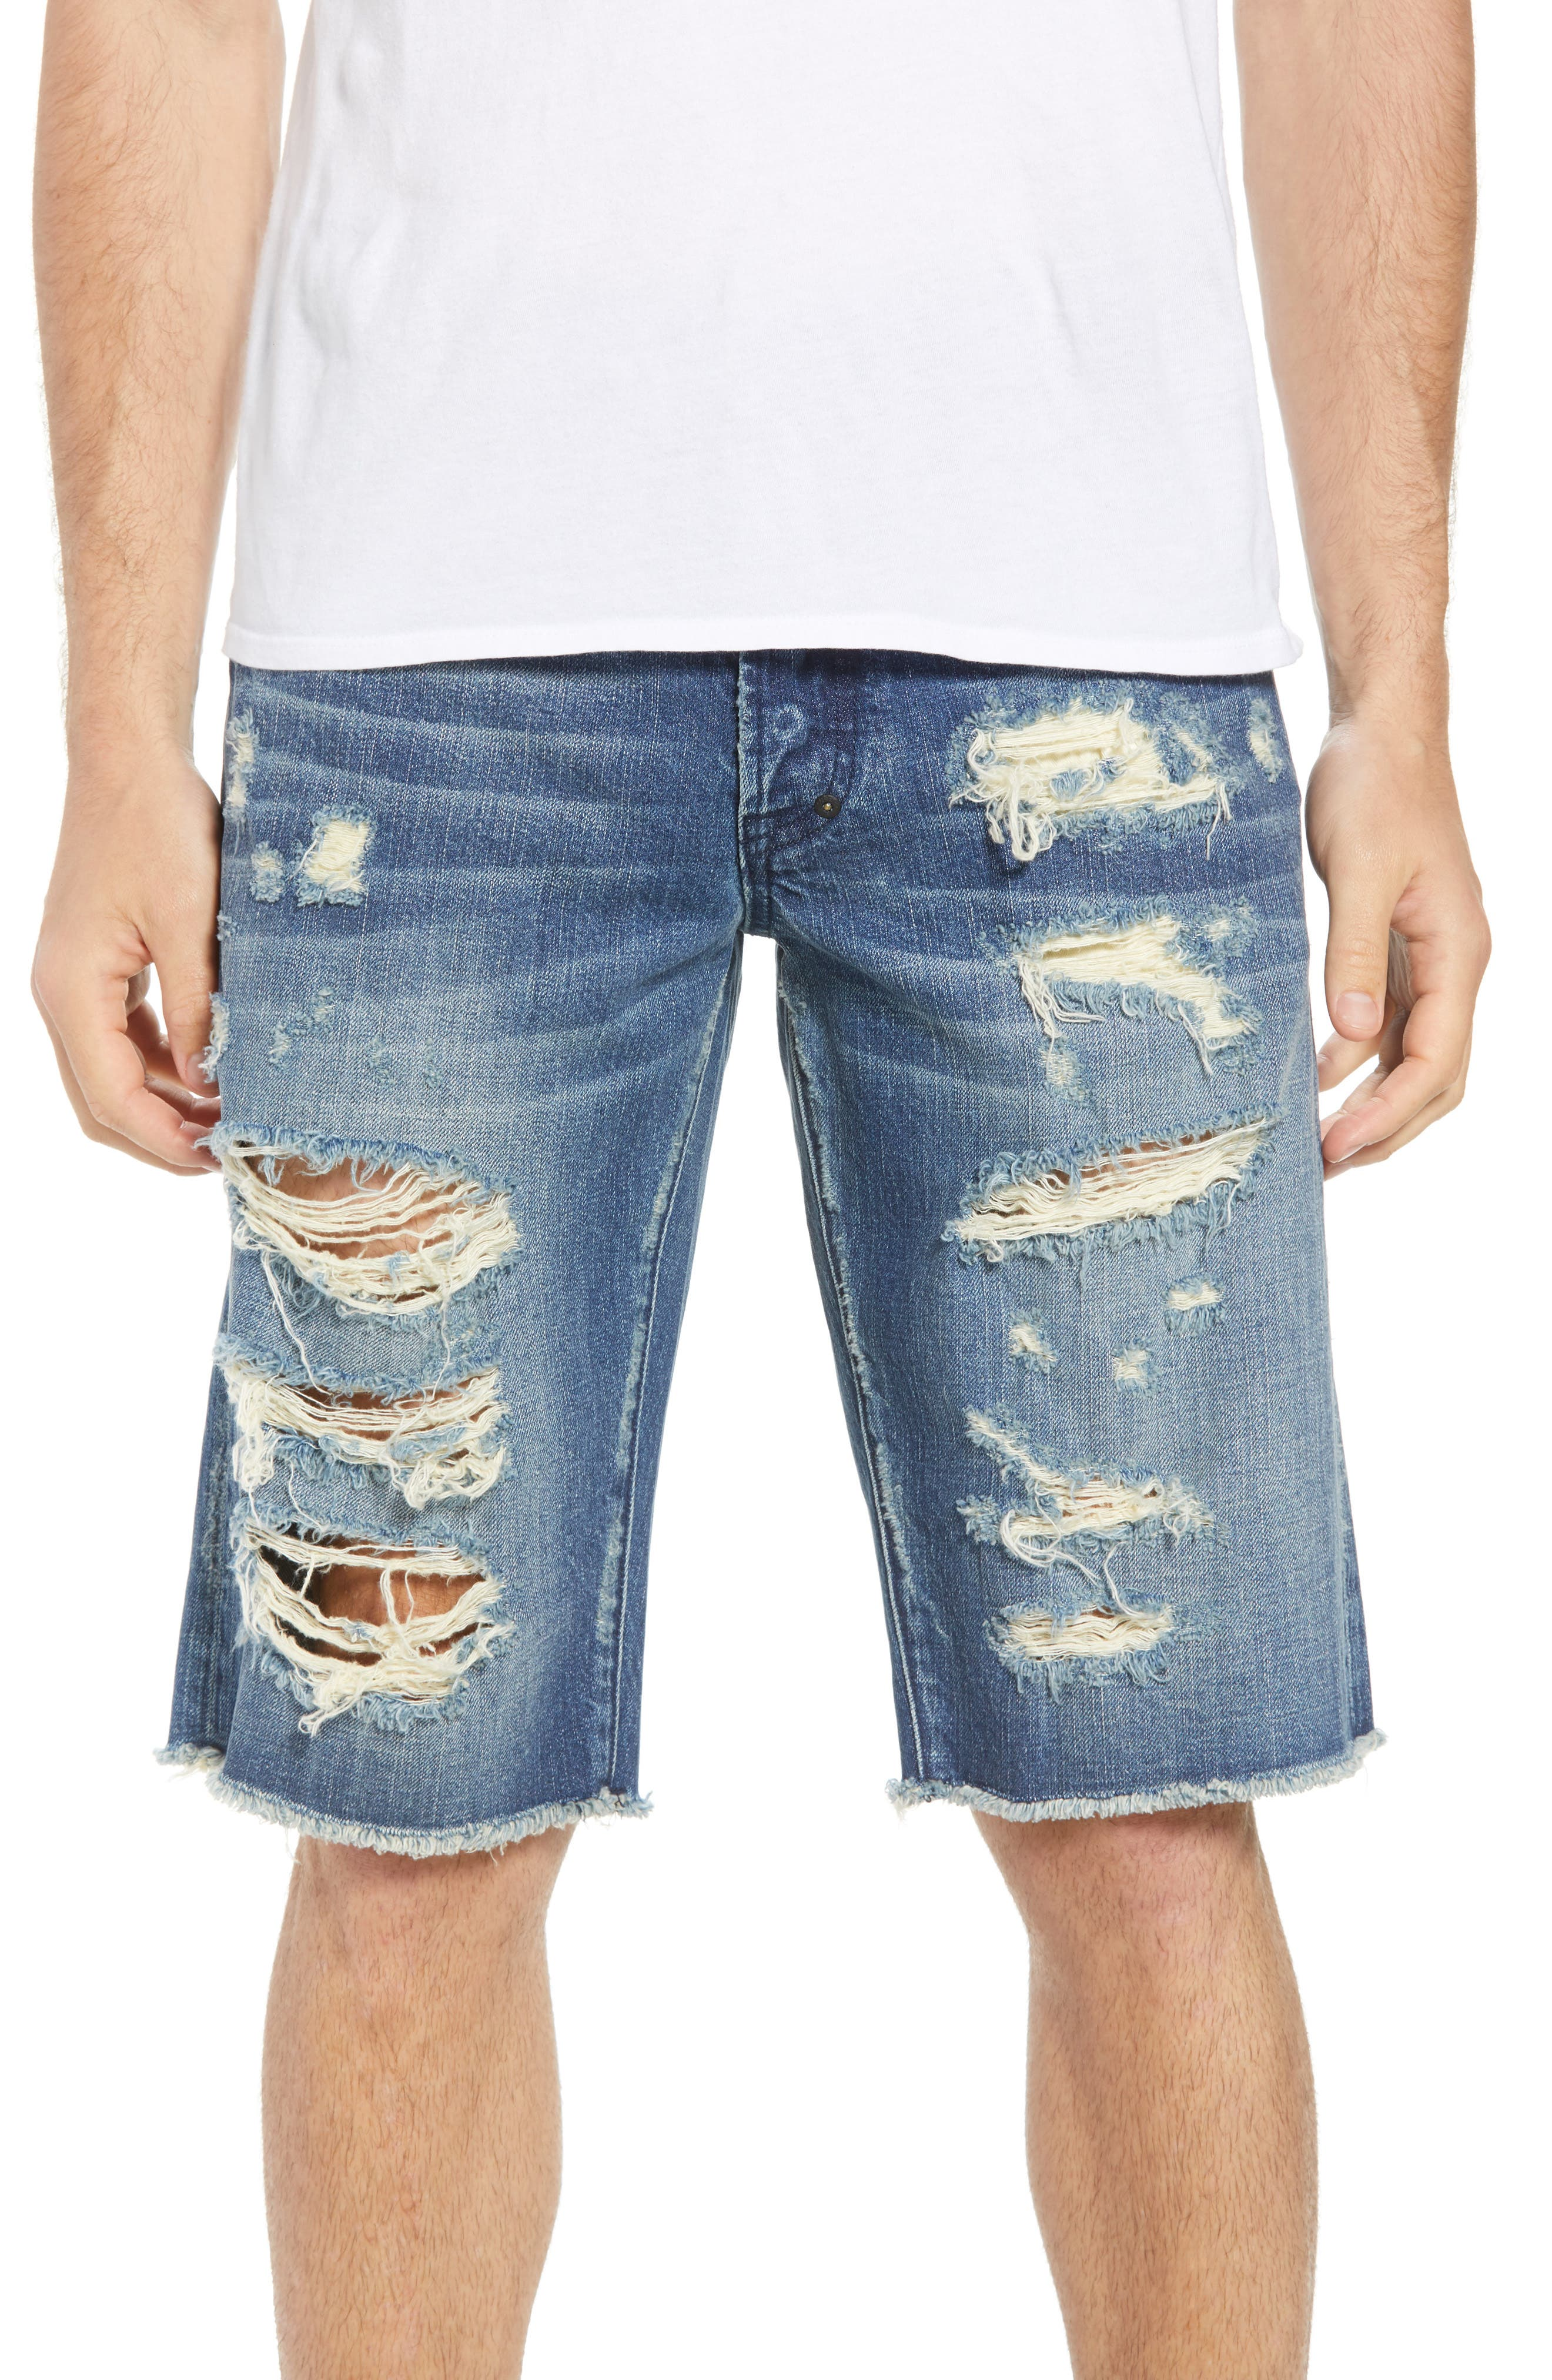 Challenger Regular Fit Shorts,                             Main thumbnail 1, color,                             WHISPERING